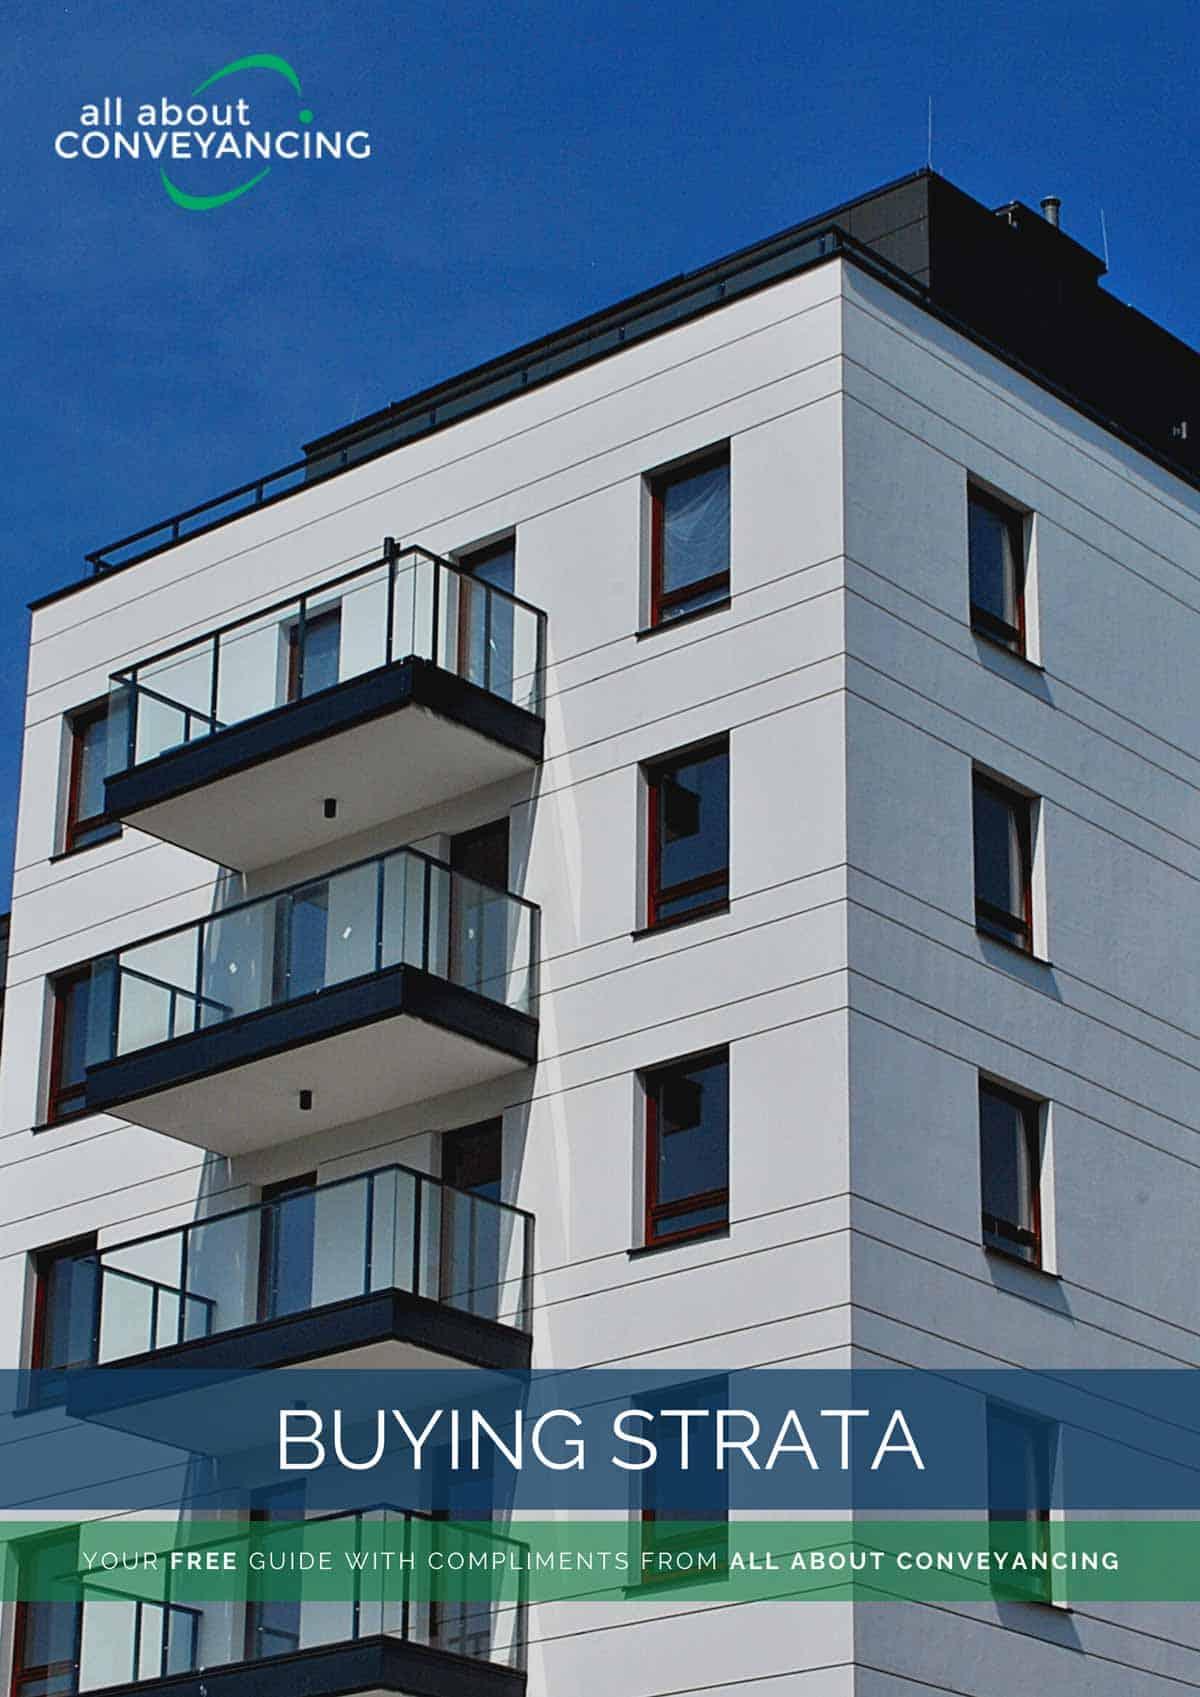 Buying Strata Report